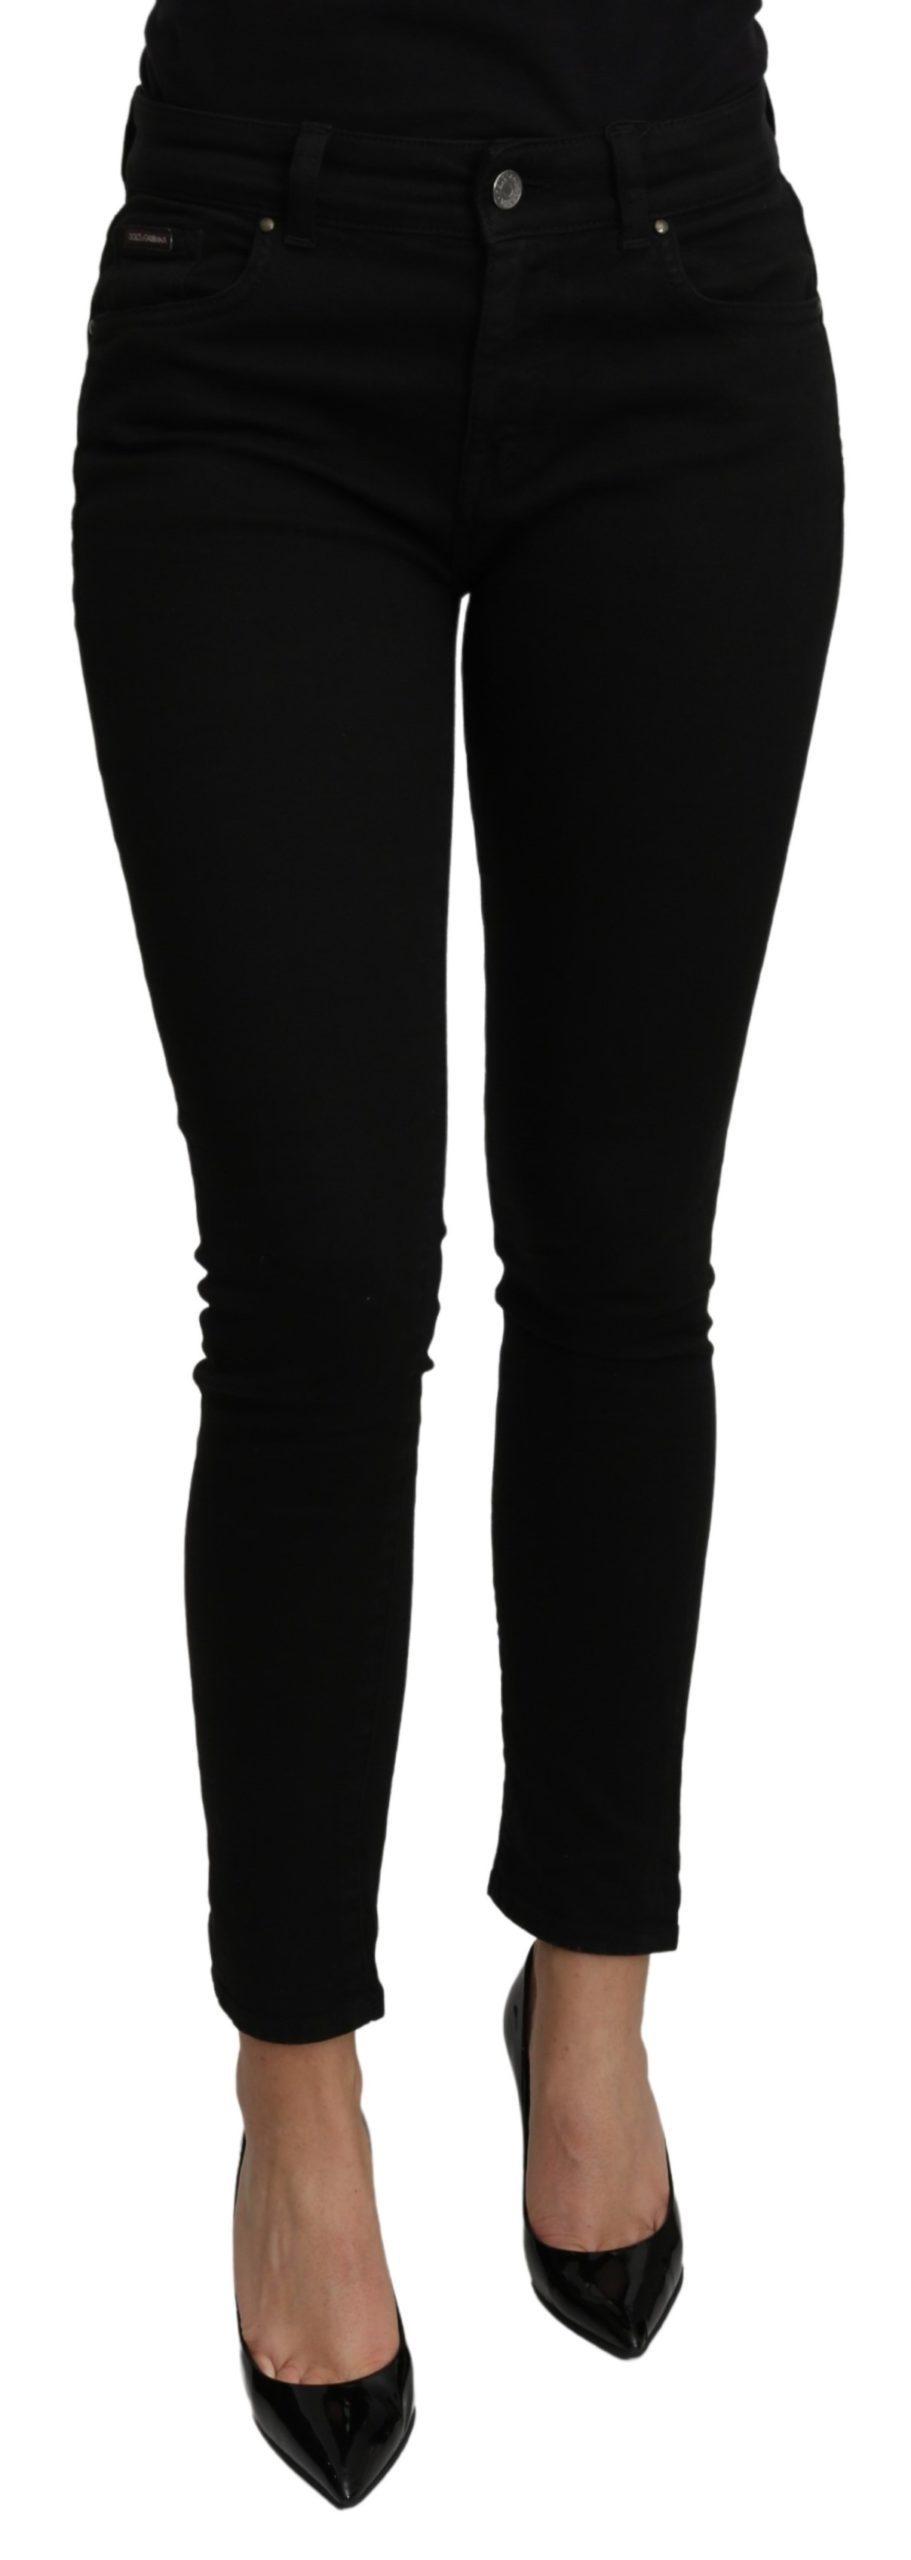 Dolce & Gabbana Women's Skinny Mid Waist Cotton Jeans Black PAN70977 - IT38|XS